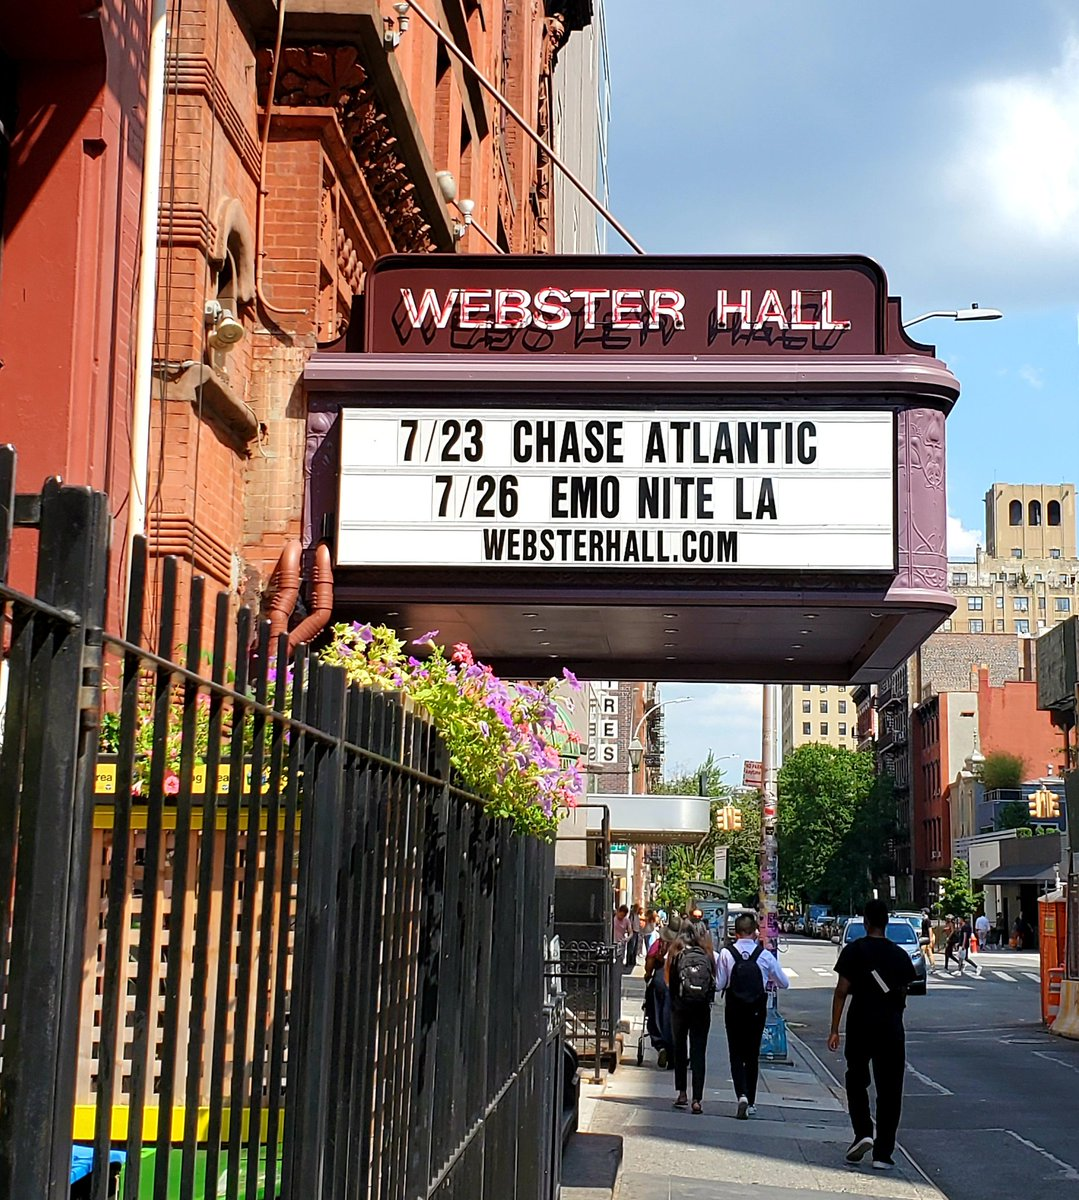 Yo @yungblud See ya in NYC @WebsterHall Oct.14th  <br>http://pic.twitter.com/swKZ1QhgL8